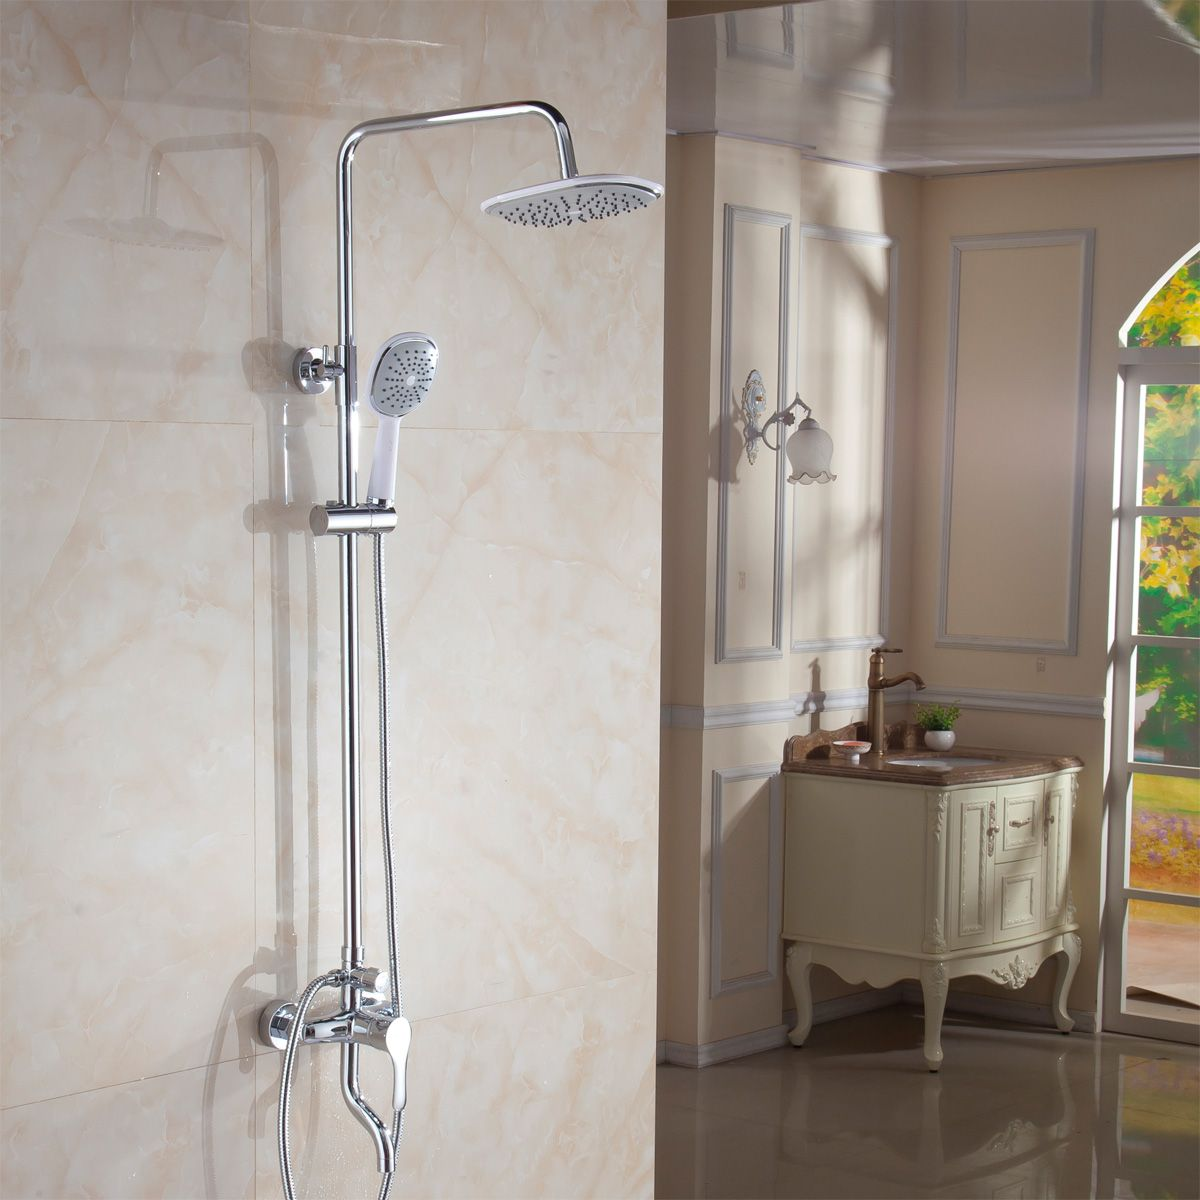 The Bright Sun Rain Shower Copper Set Off Water Toilet Shower ...